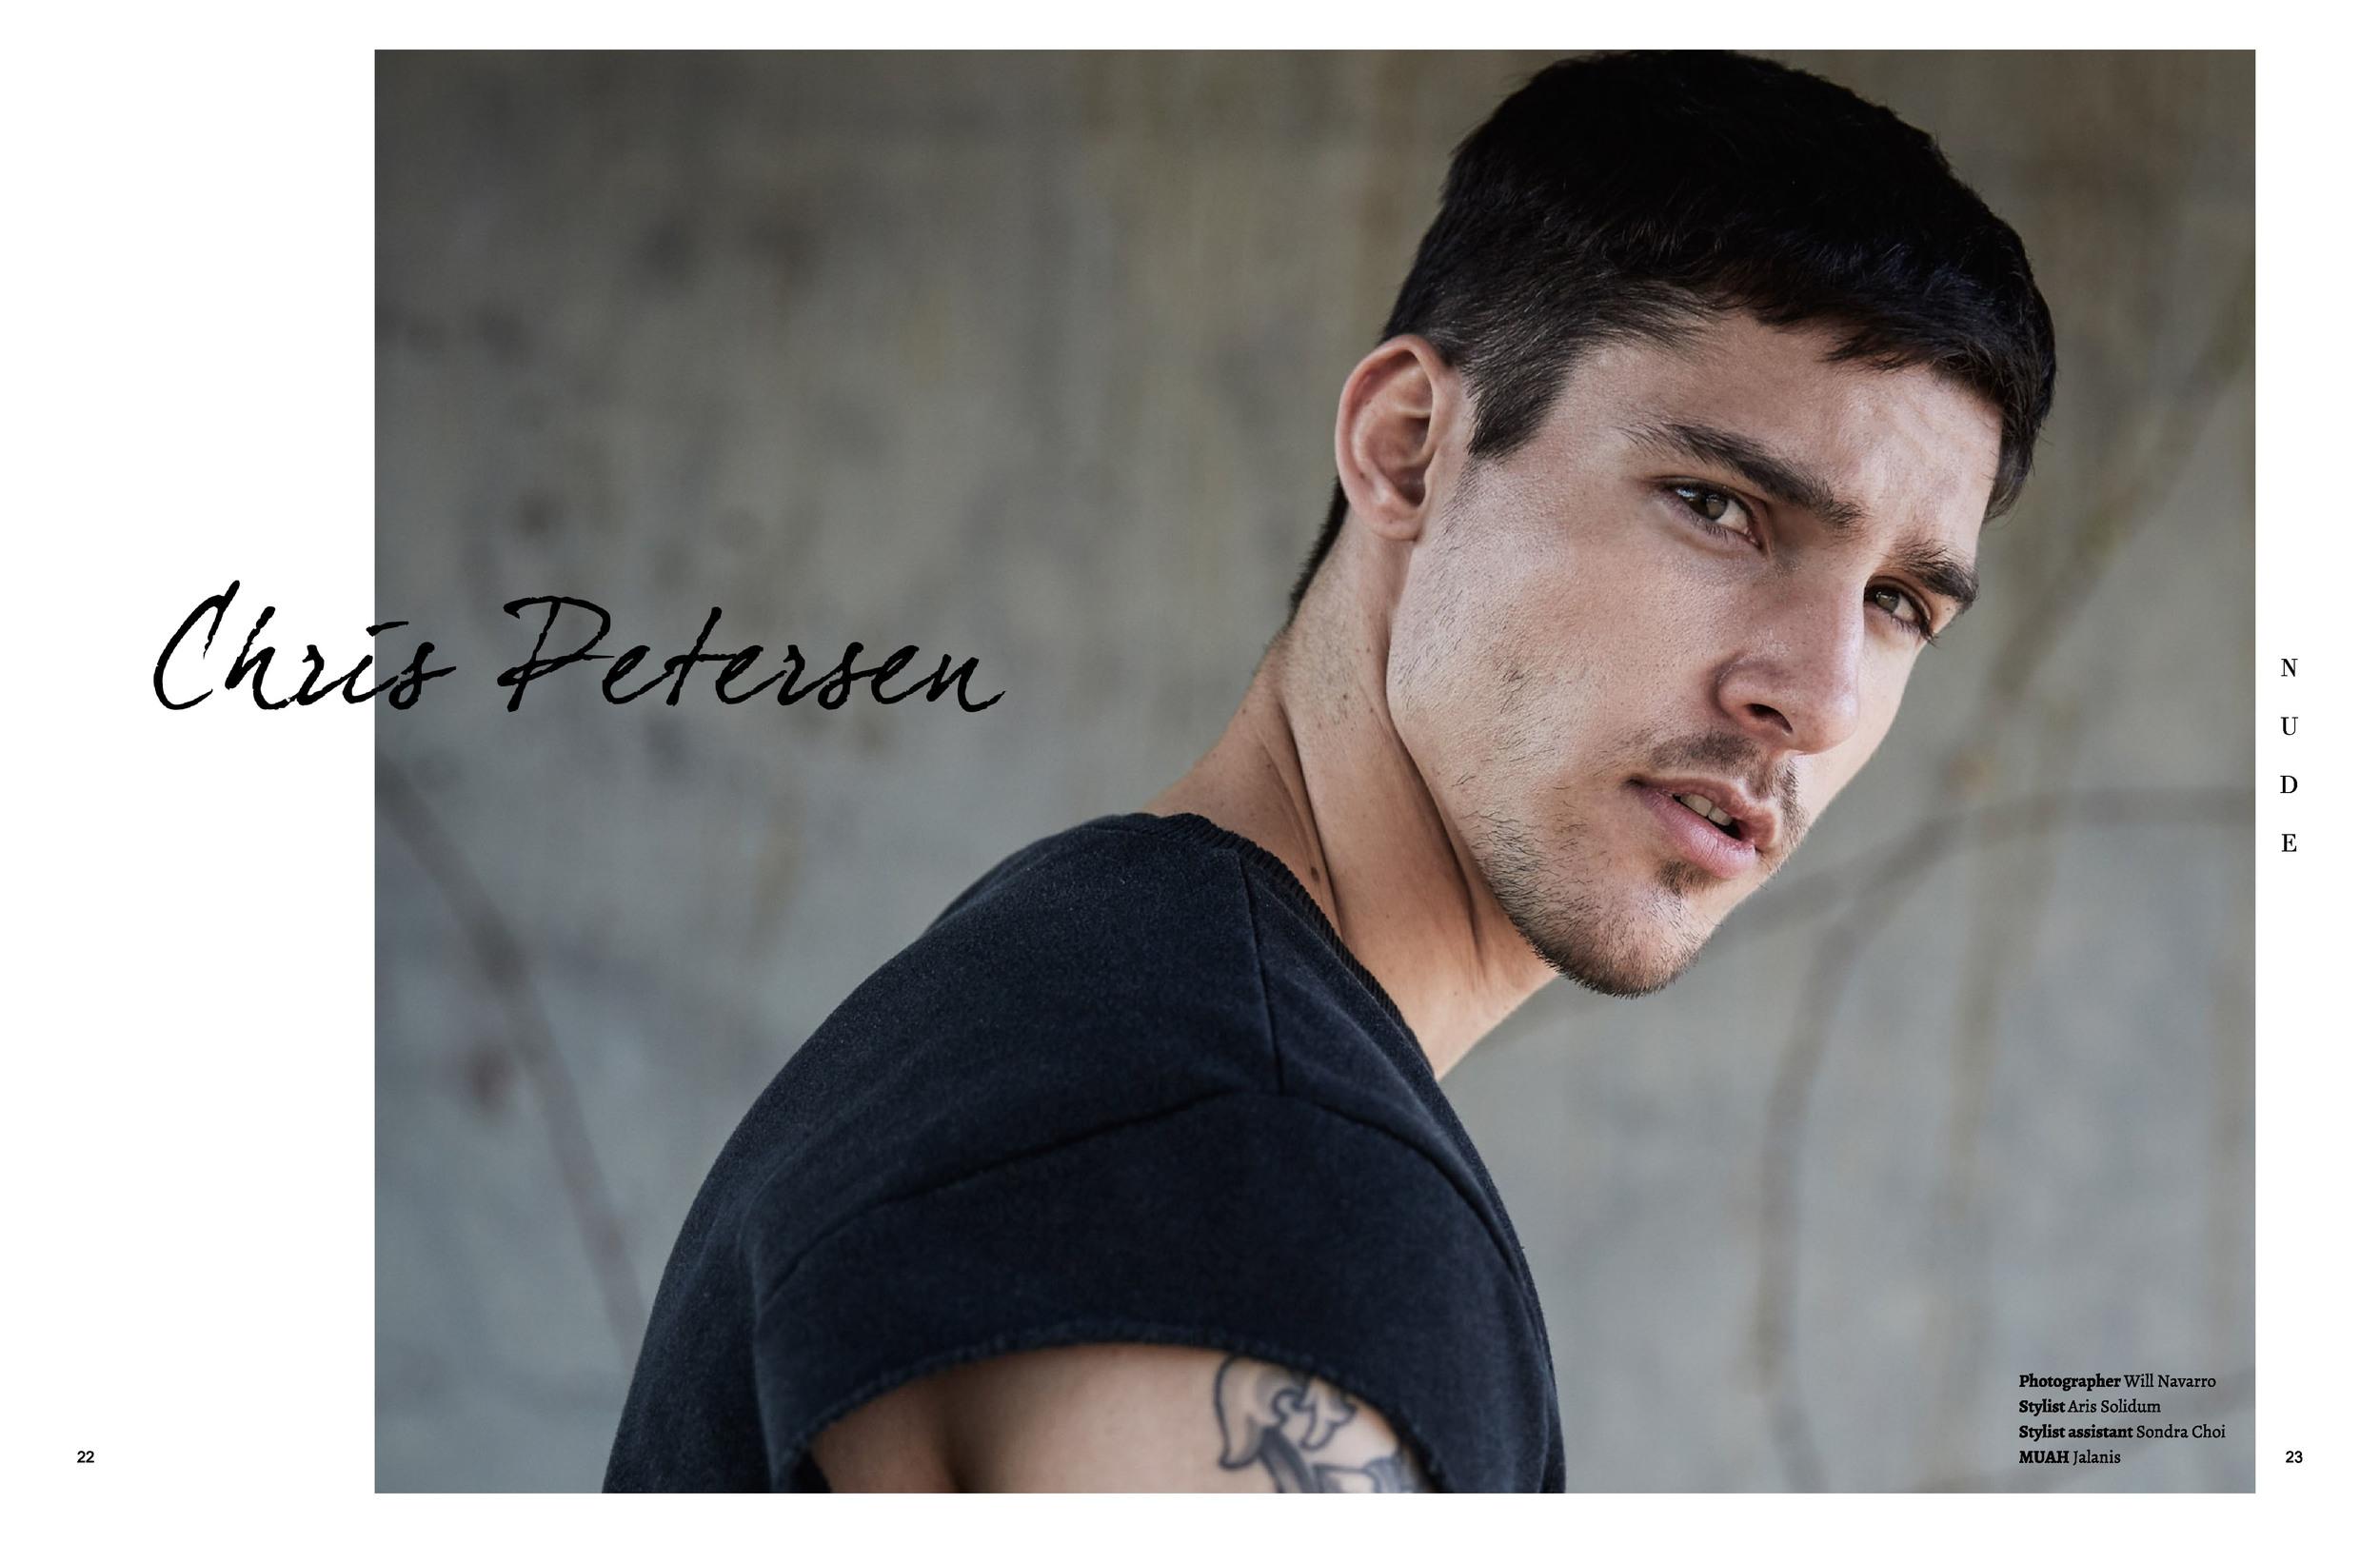 Chris_Petersen_NUDEMagazineIssue3_LA-Models_2.jpg